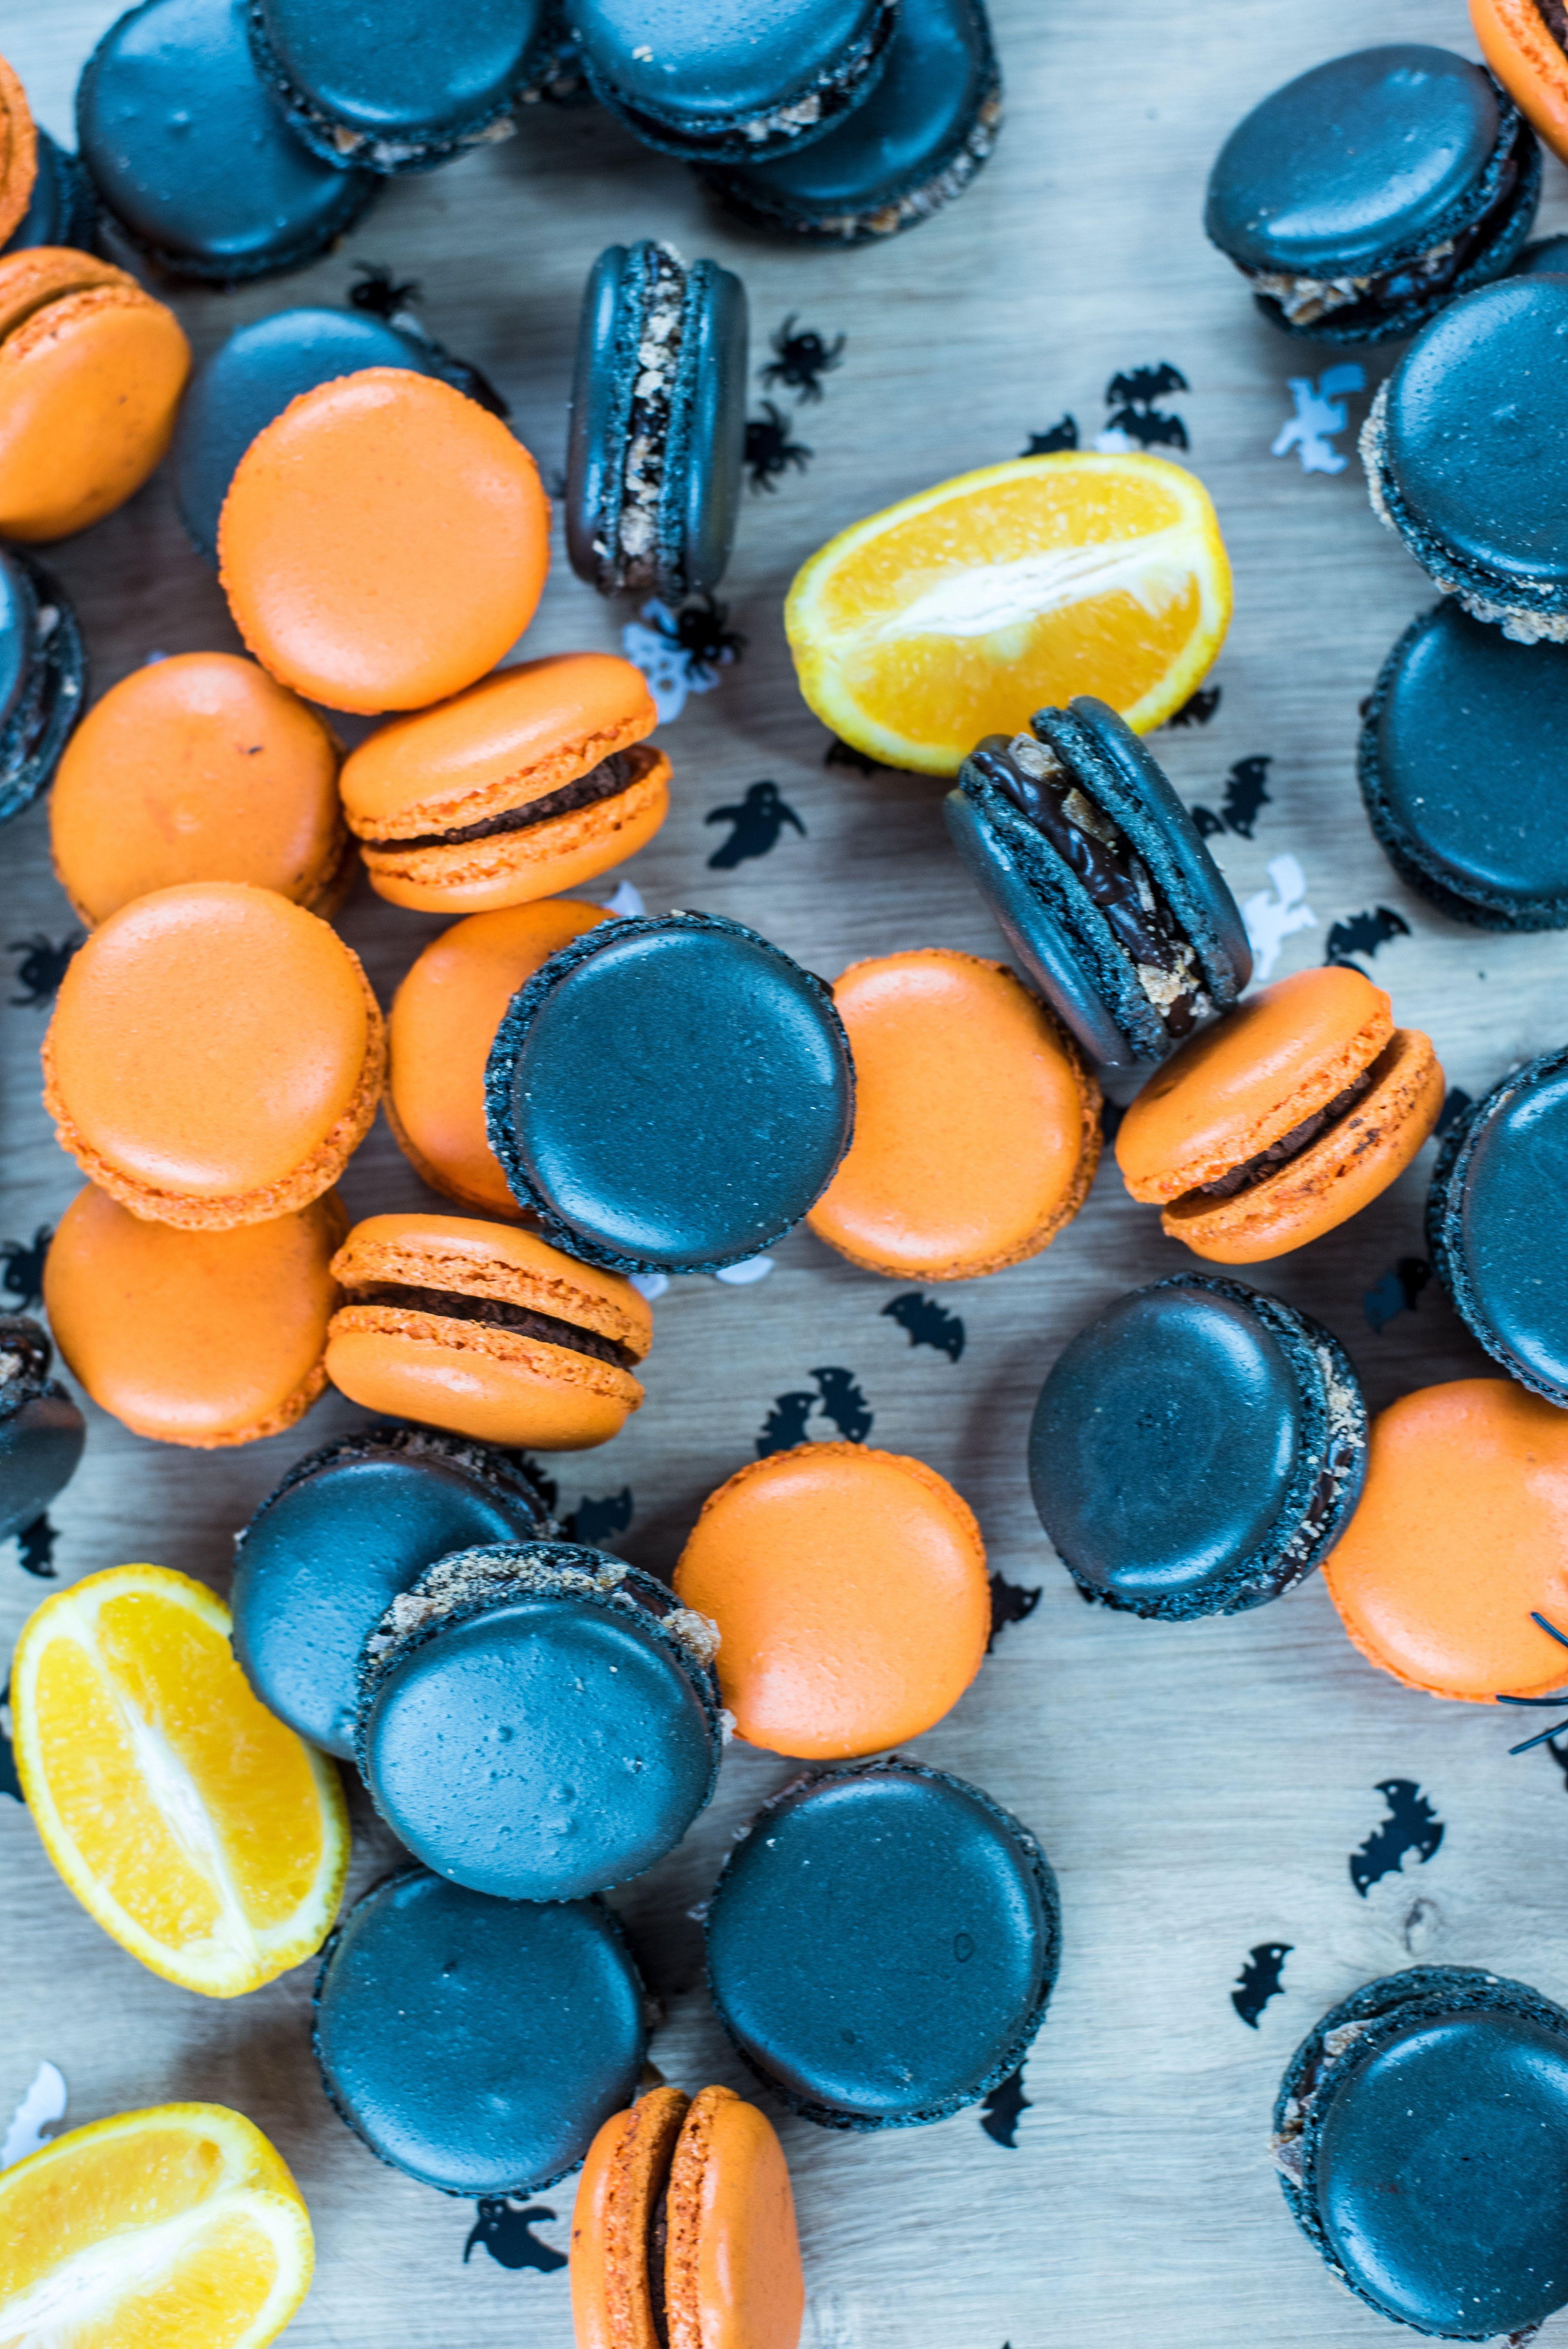 Halloween In Belgie.Halloween Food Inspiration Delicious Macarons In Blue And